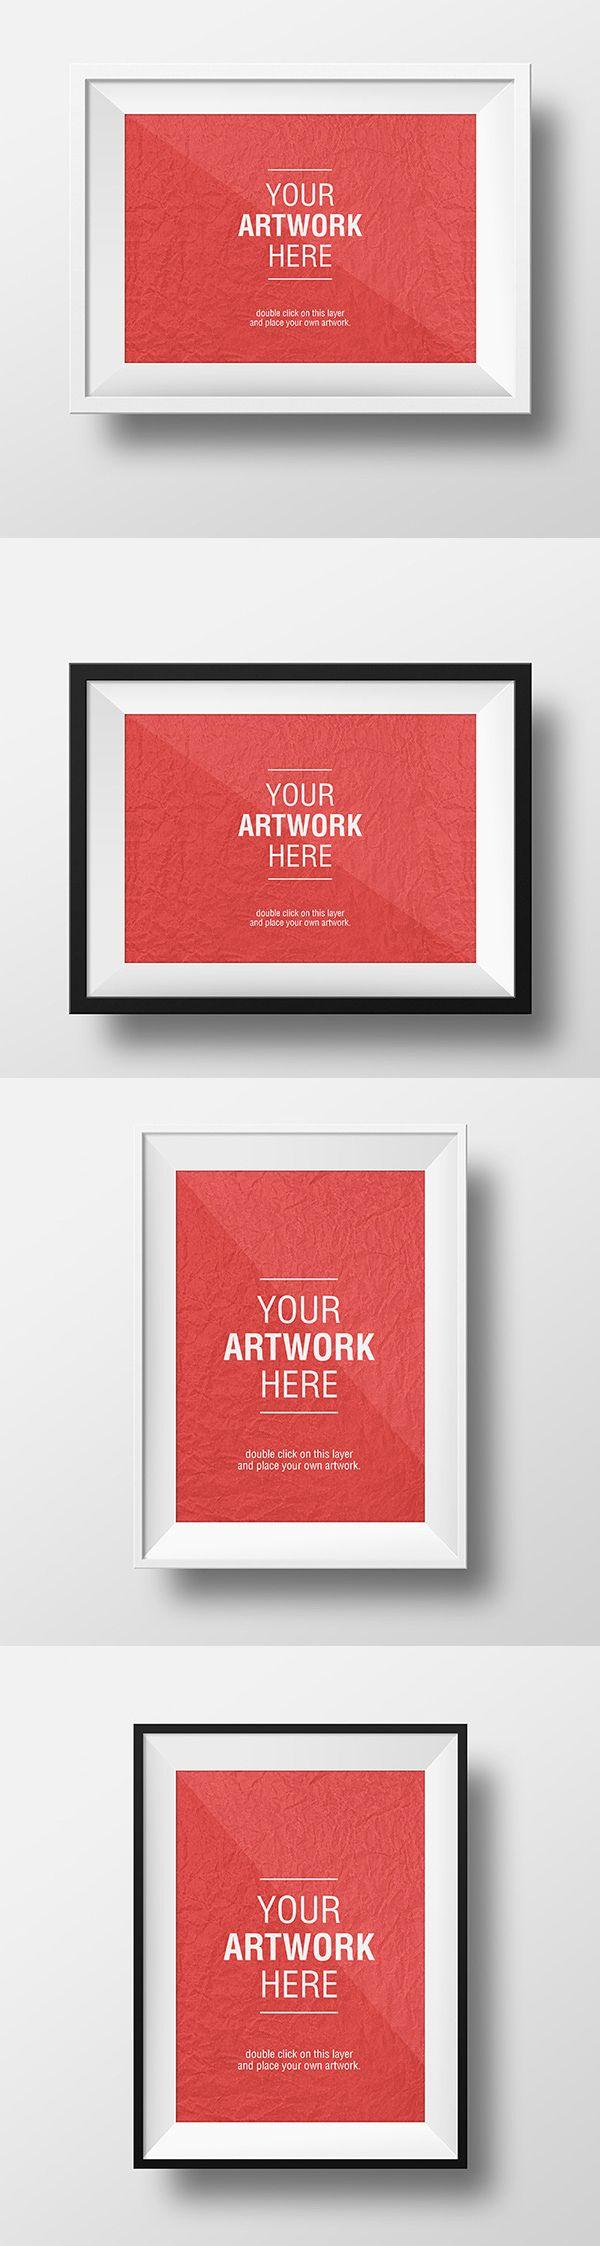 psd poster flyer mock up templates artworks student 25 psd poster flyer mockups these mockups will help you